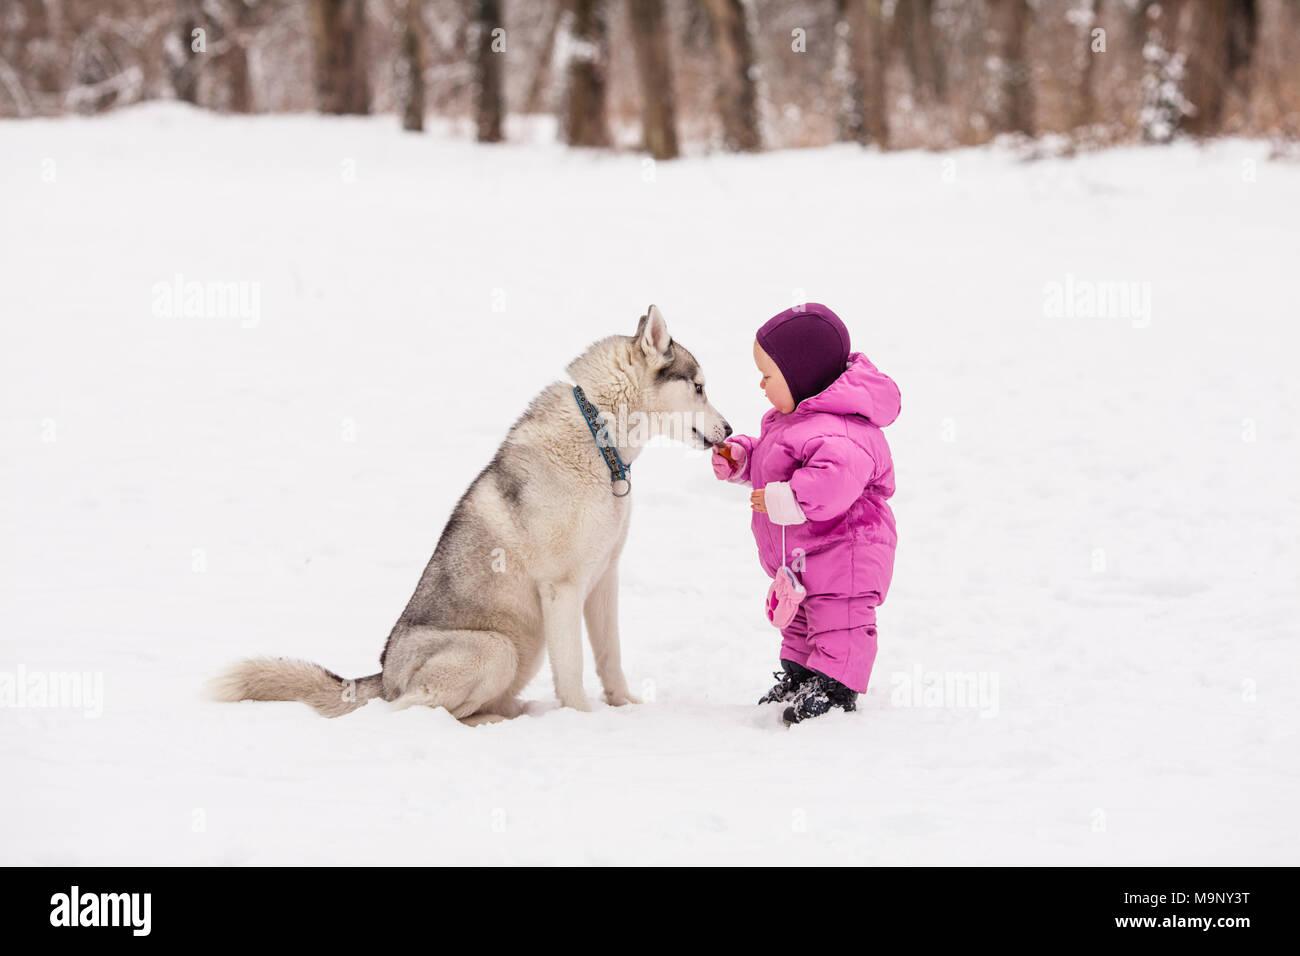 Little Baby With Husky Dog Stock Photo 178117852 Alamy